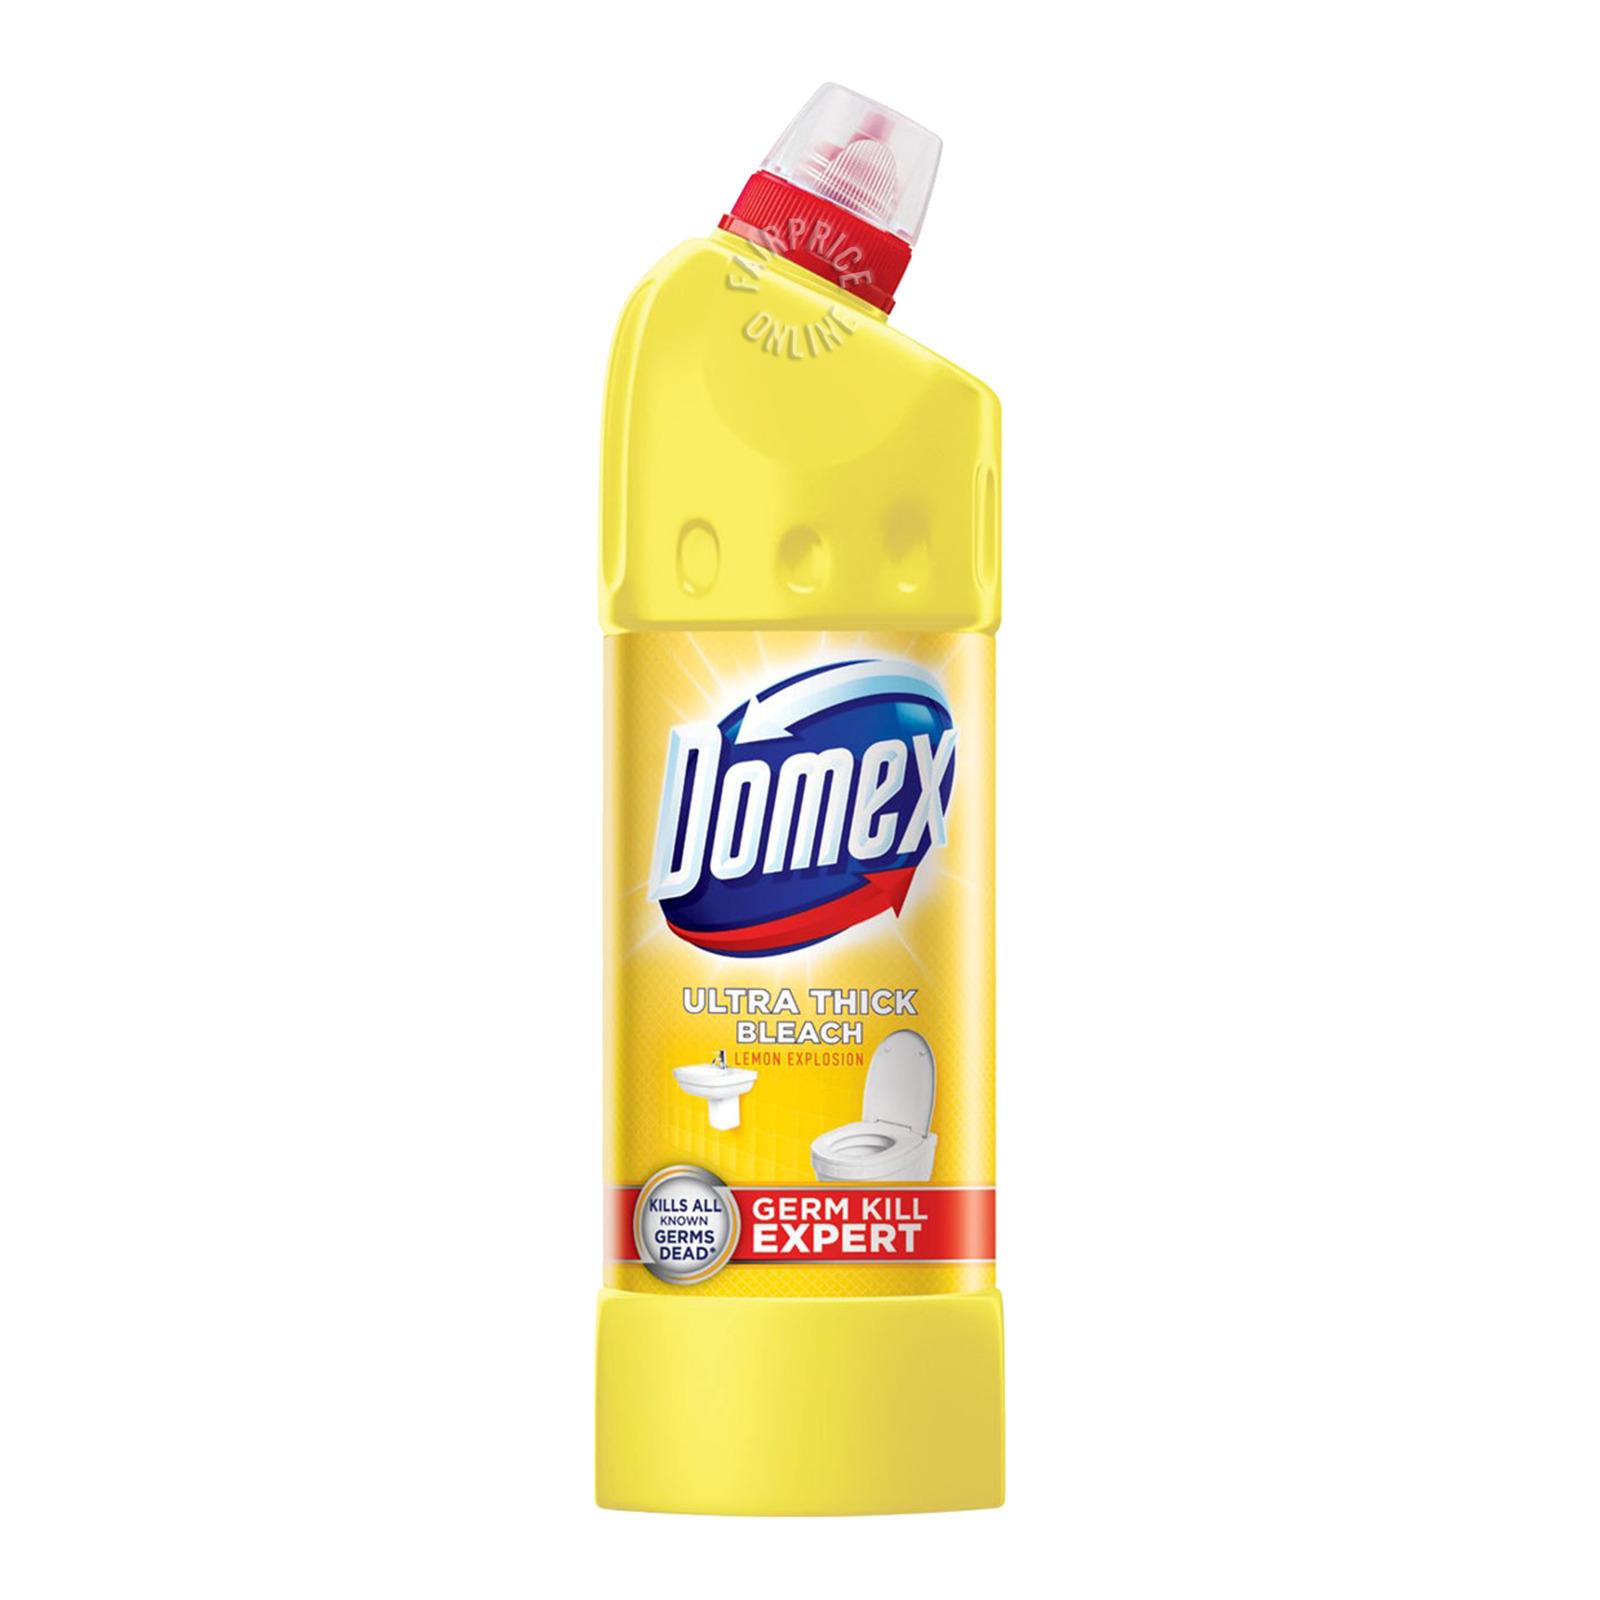 Domex Ultra Thick Bleach - Lemon Explosion